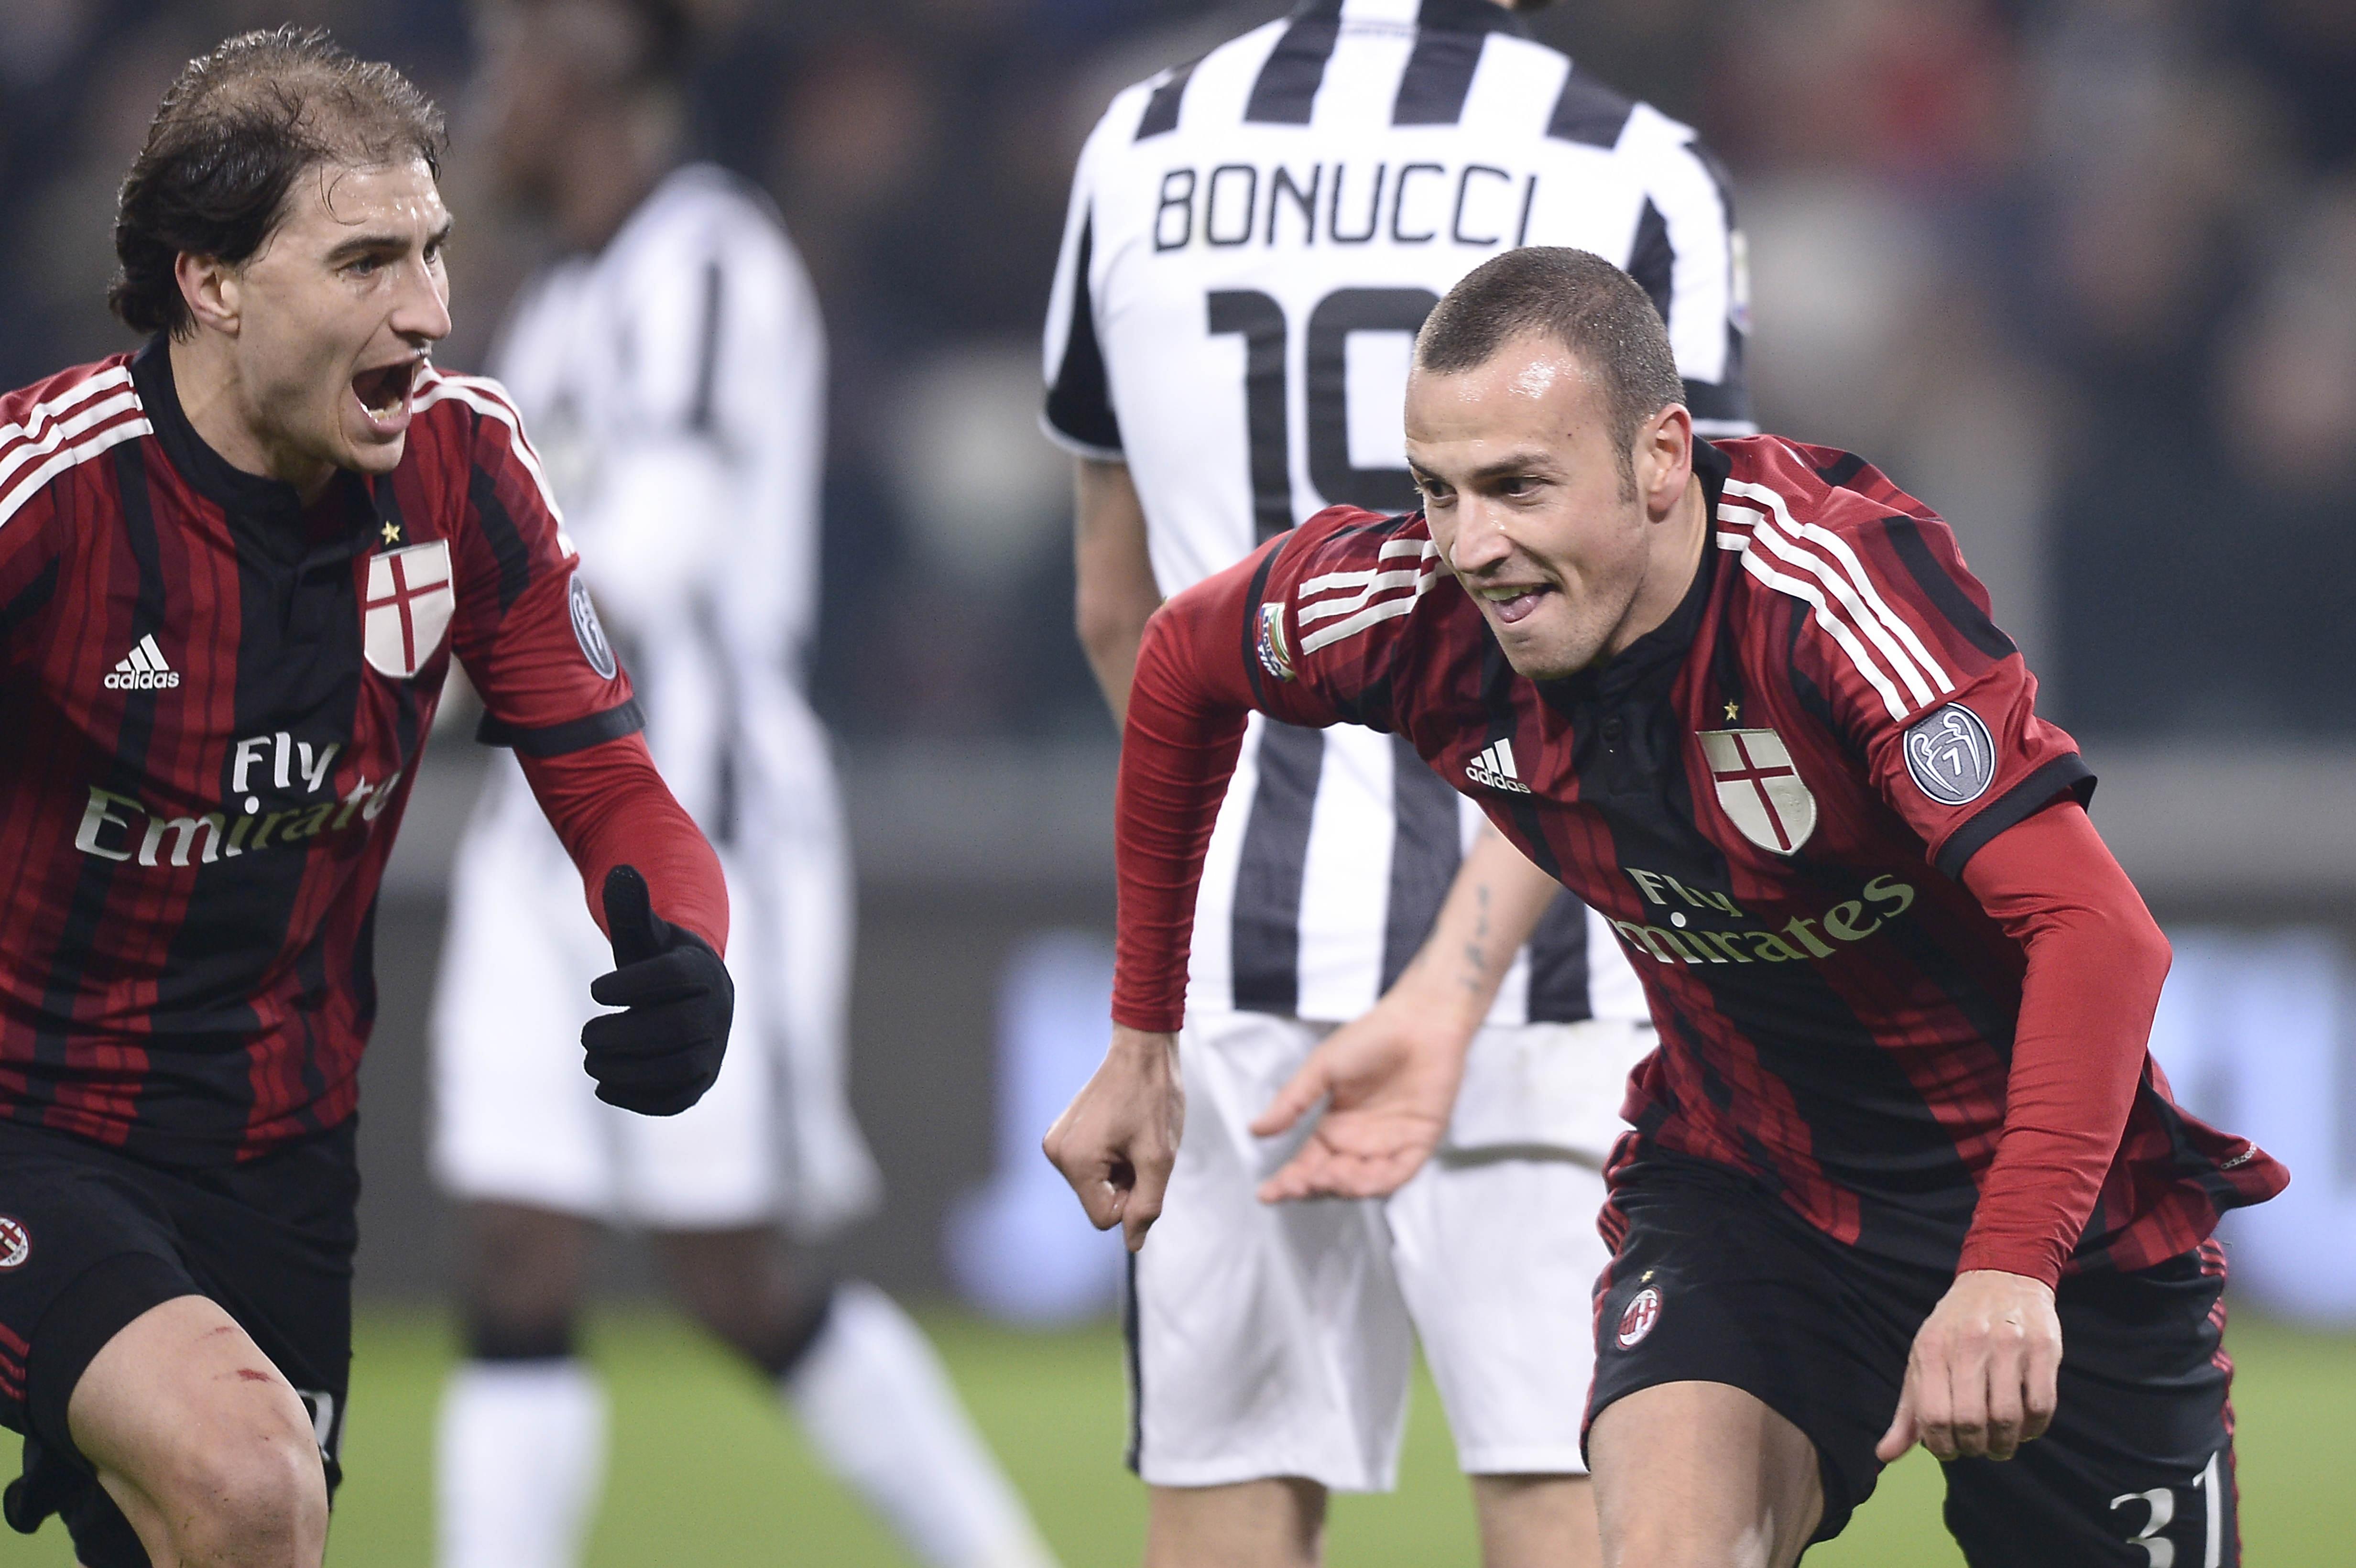 Juve - Milan: Dybala gol! Operazione sorpasso riuscita